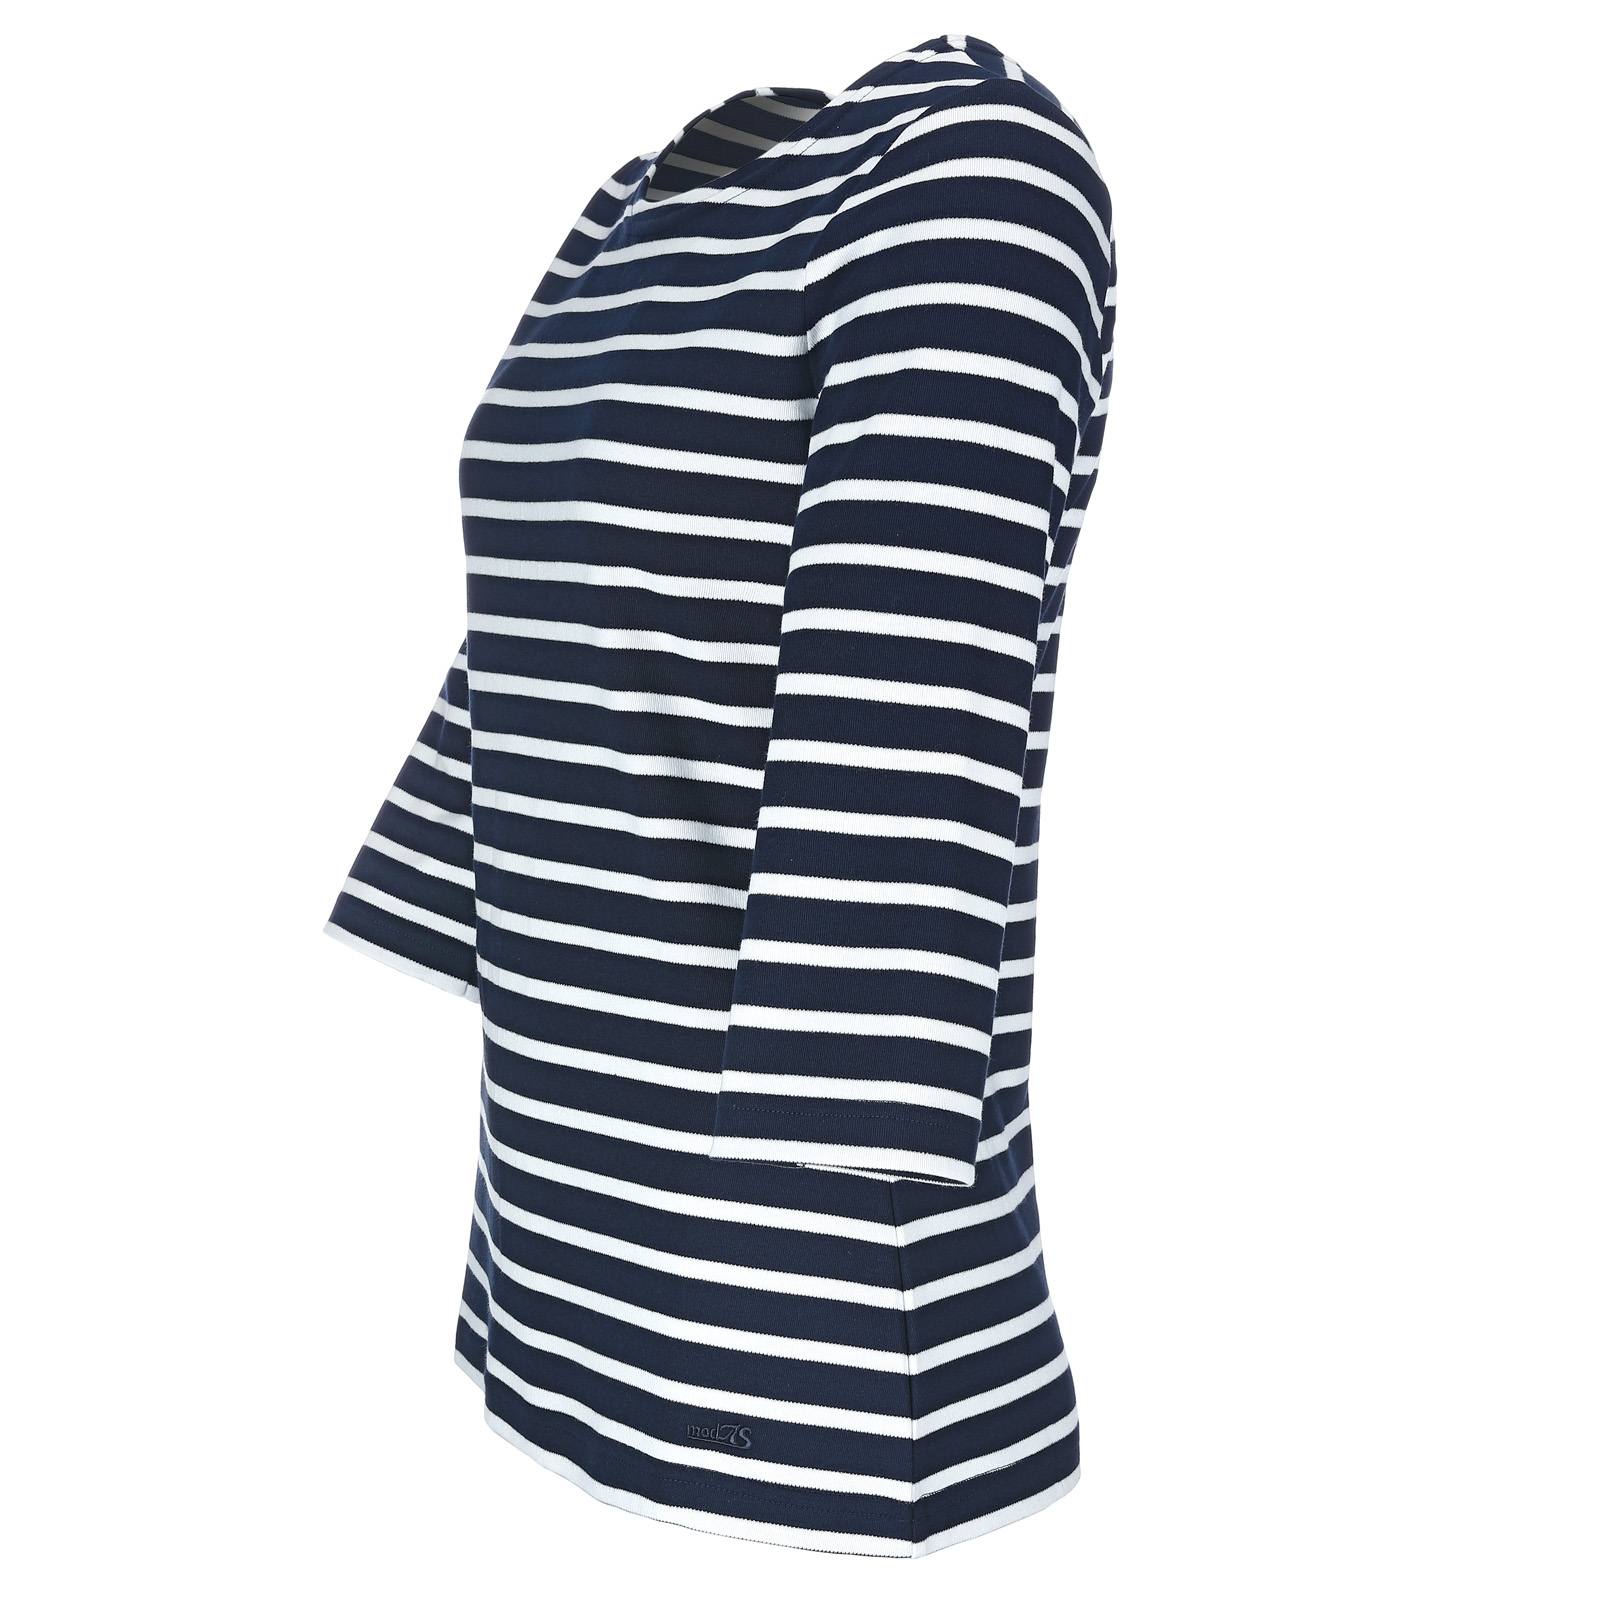 Maritimes Damenshirt 3/4-Arm magnolia/weiß